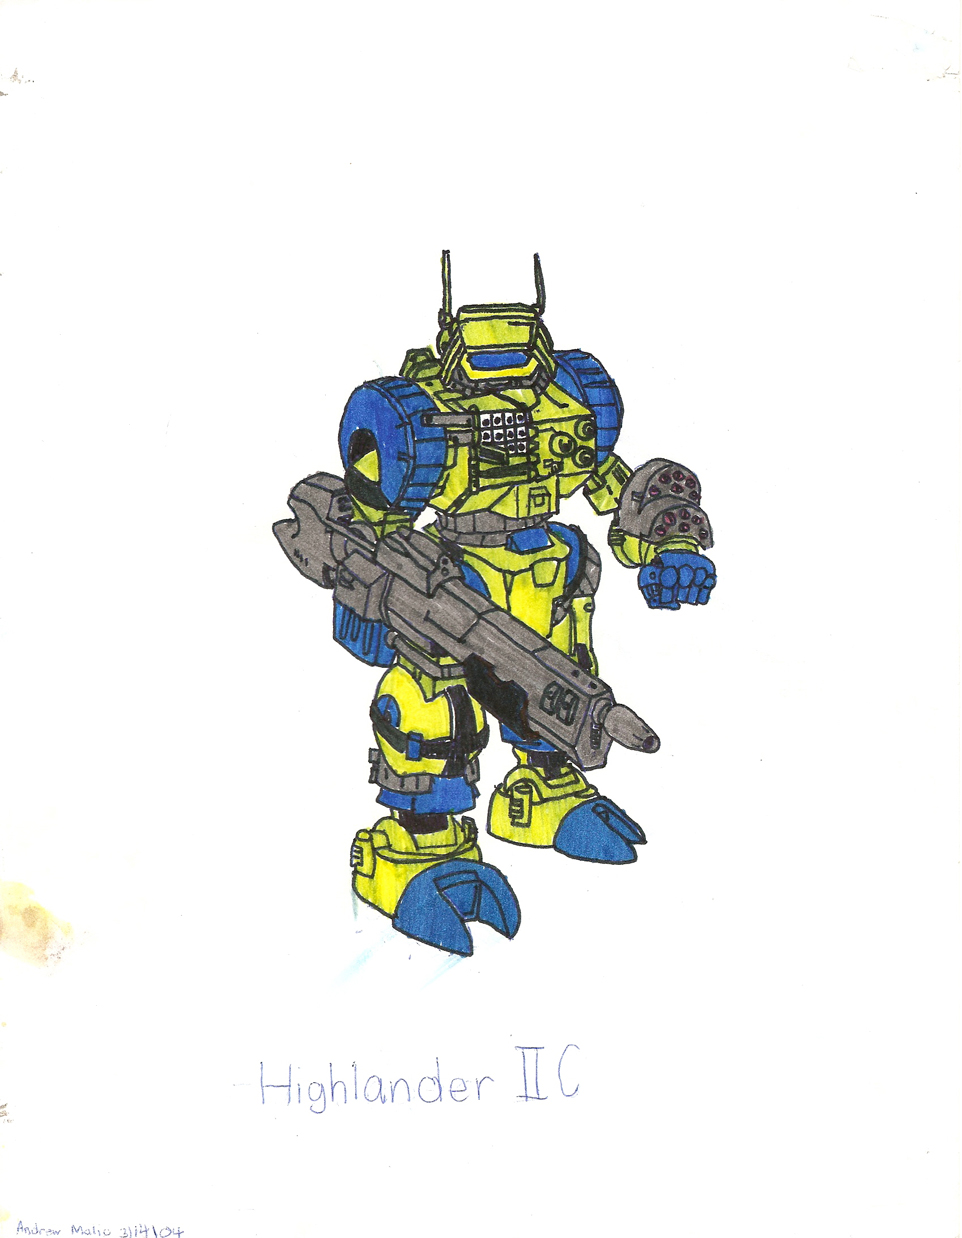 Highlander IIC by ShadowFalcon